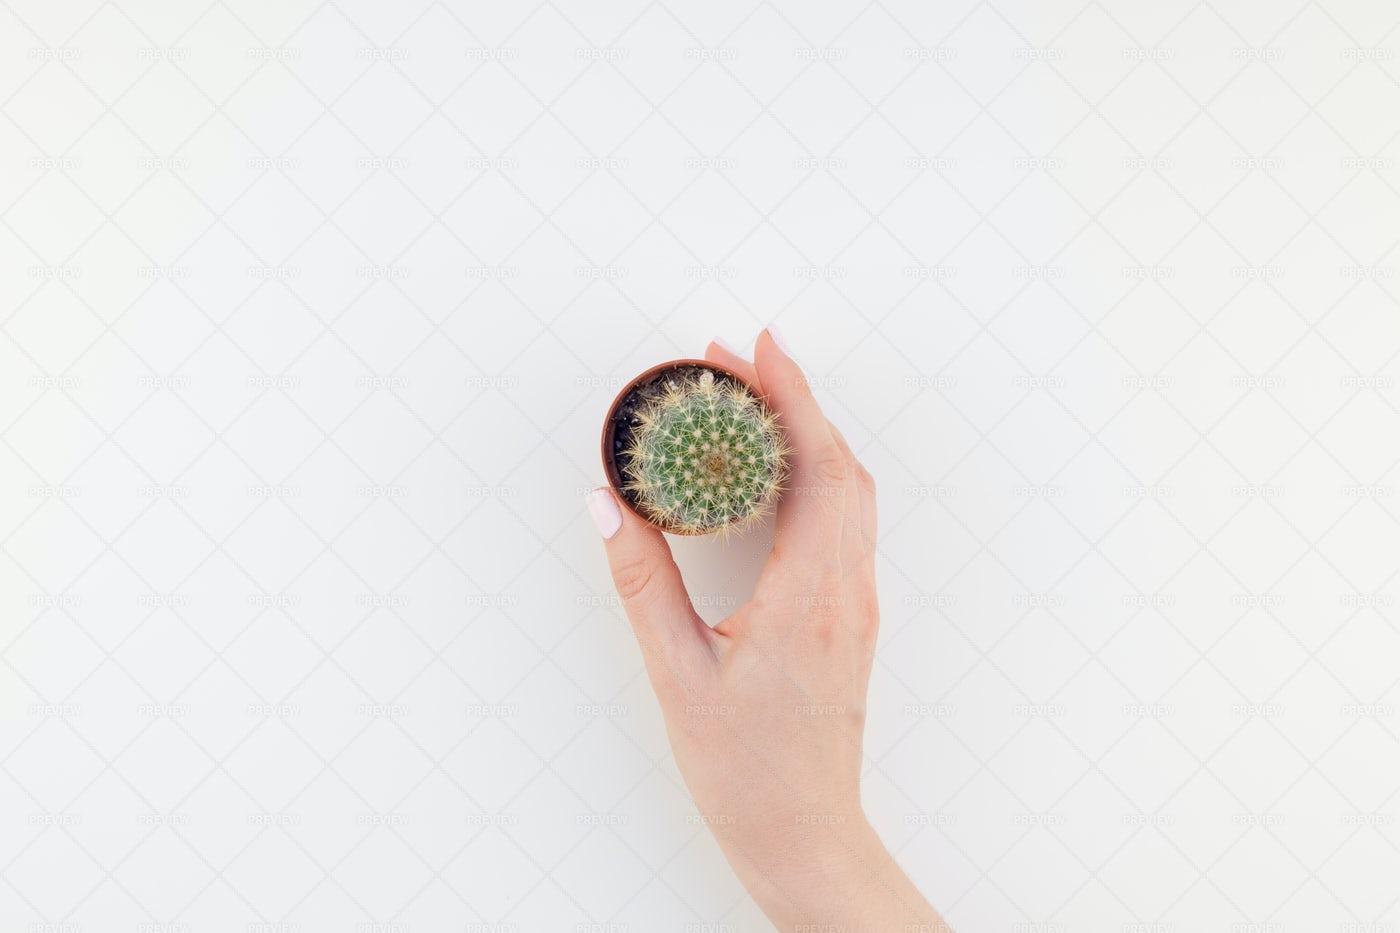 Hand Holding Cactus: Stock Photos